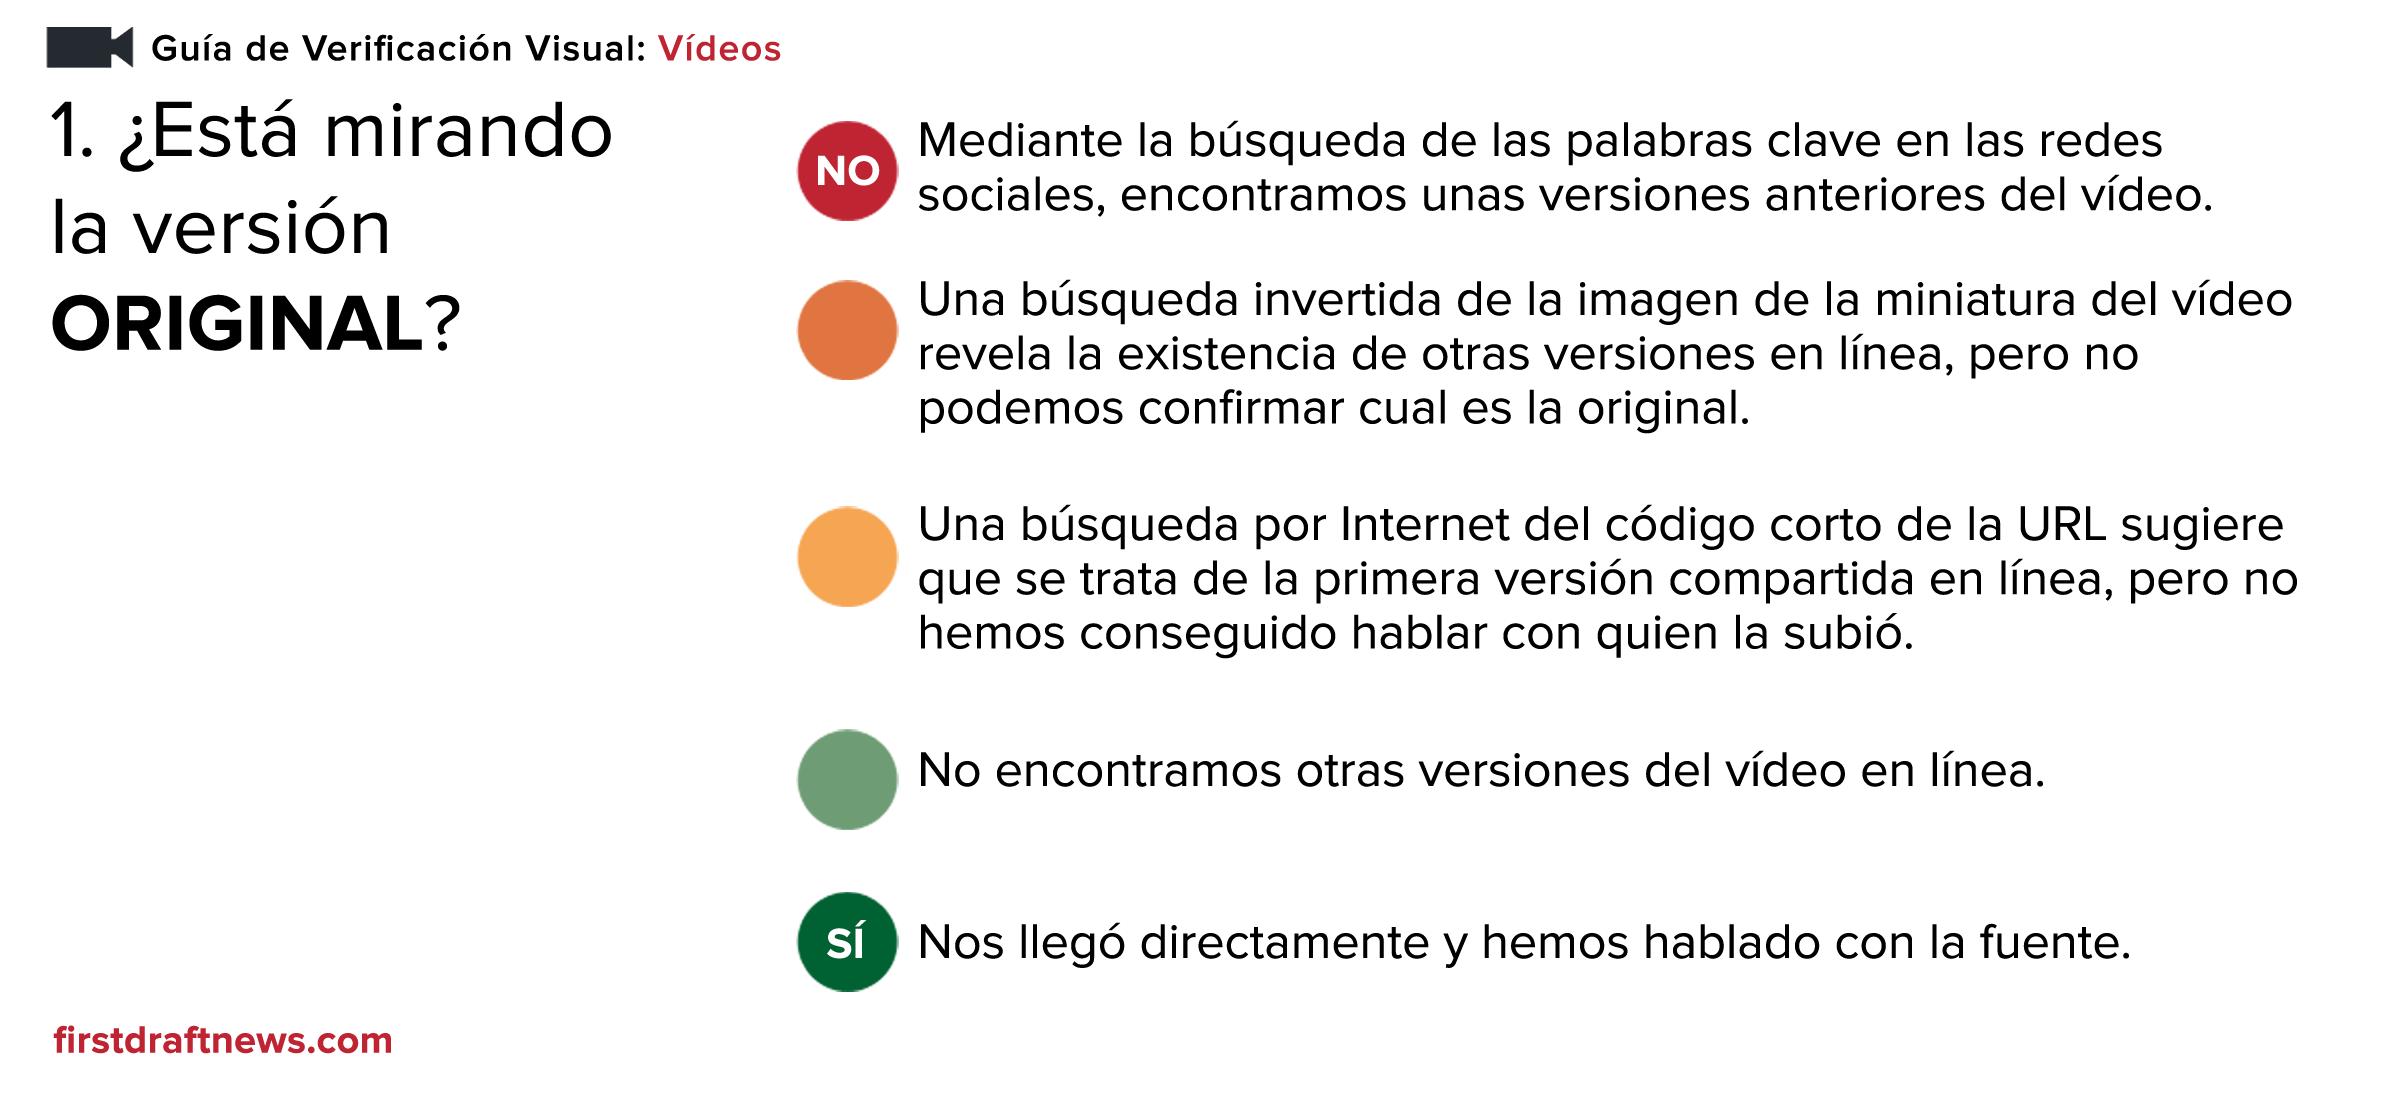 VVG - Video Spanish 1